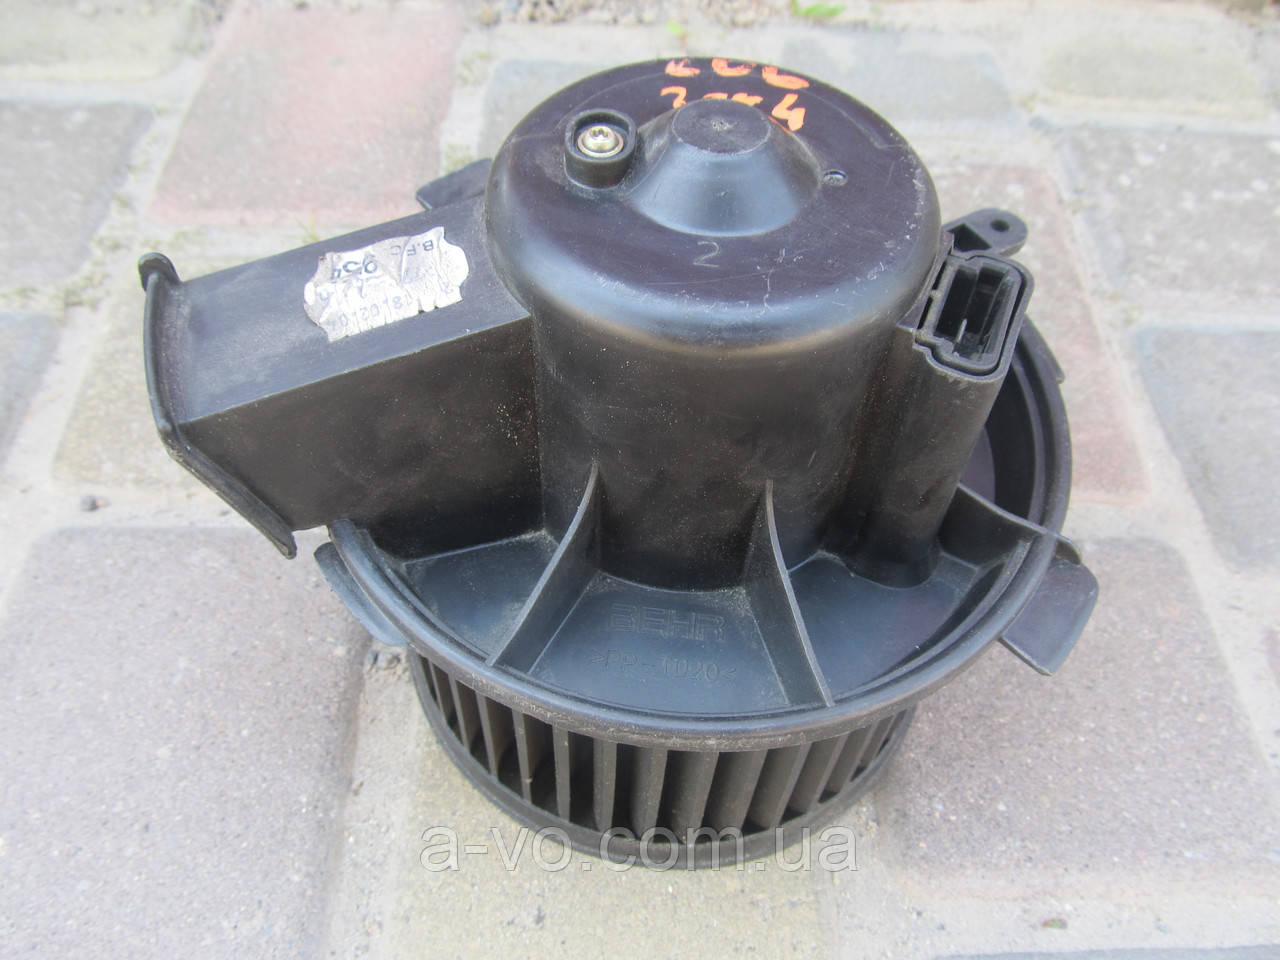 Вентилятор моторчик печки для Peugeot 206, 6424501